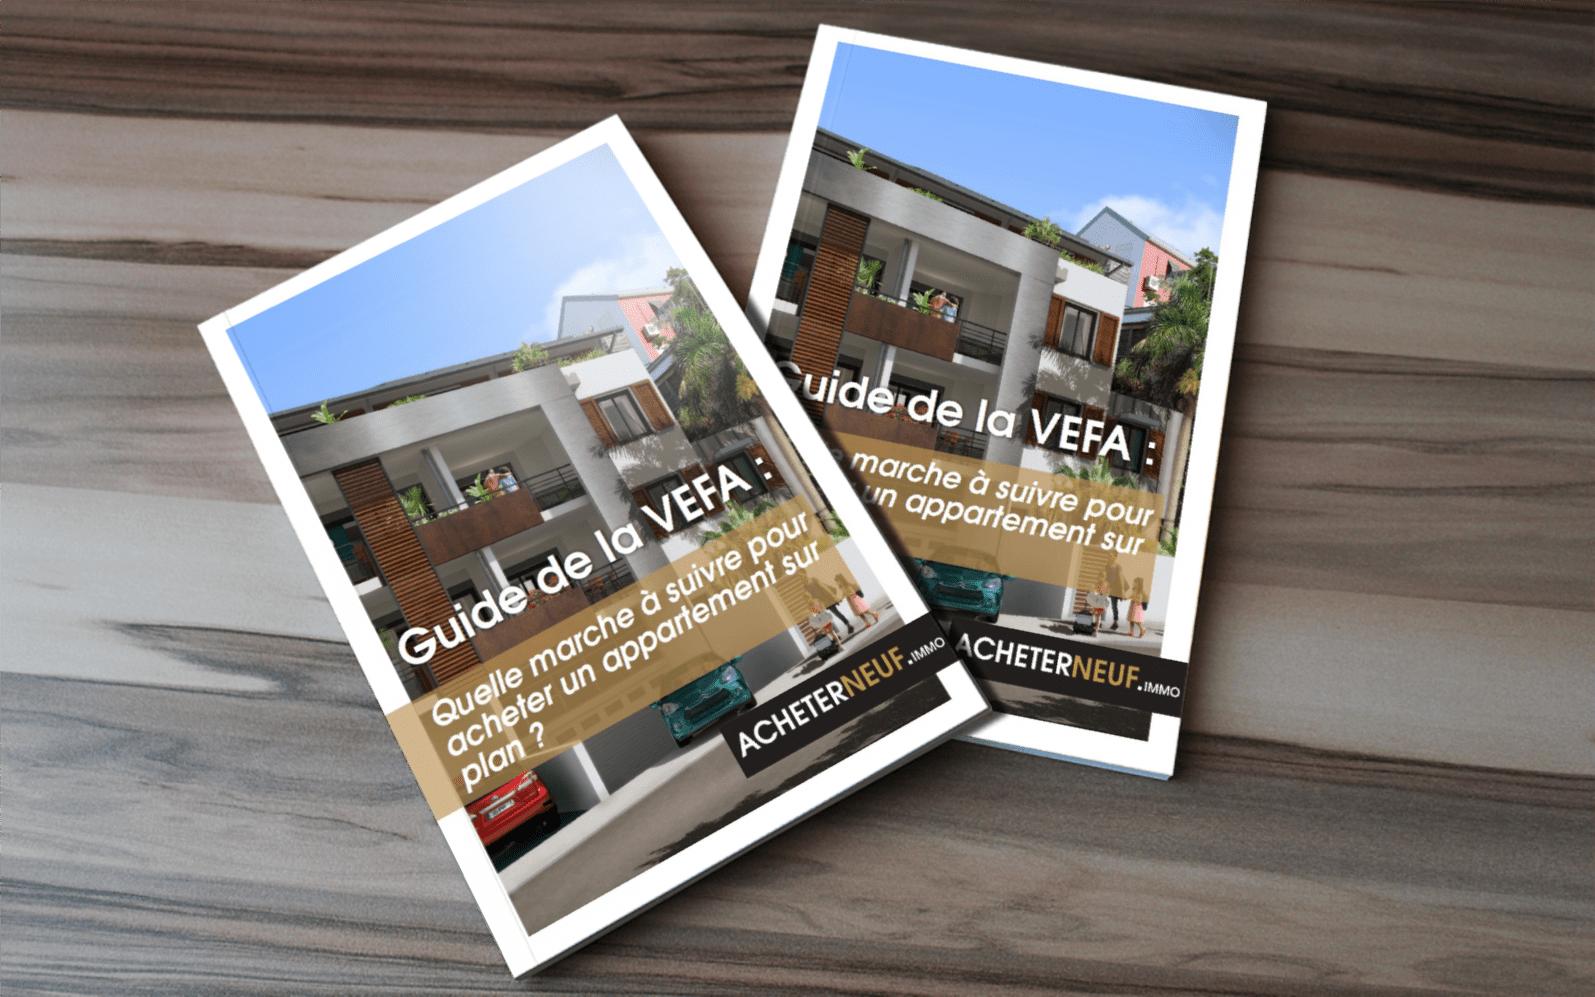 LB2 - Guide VEFA